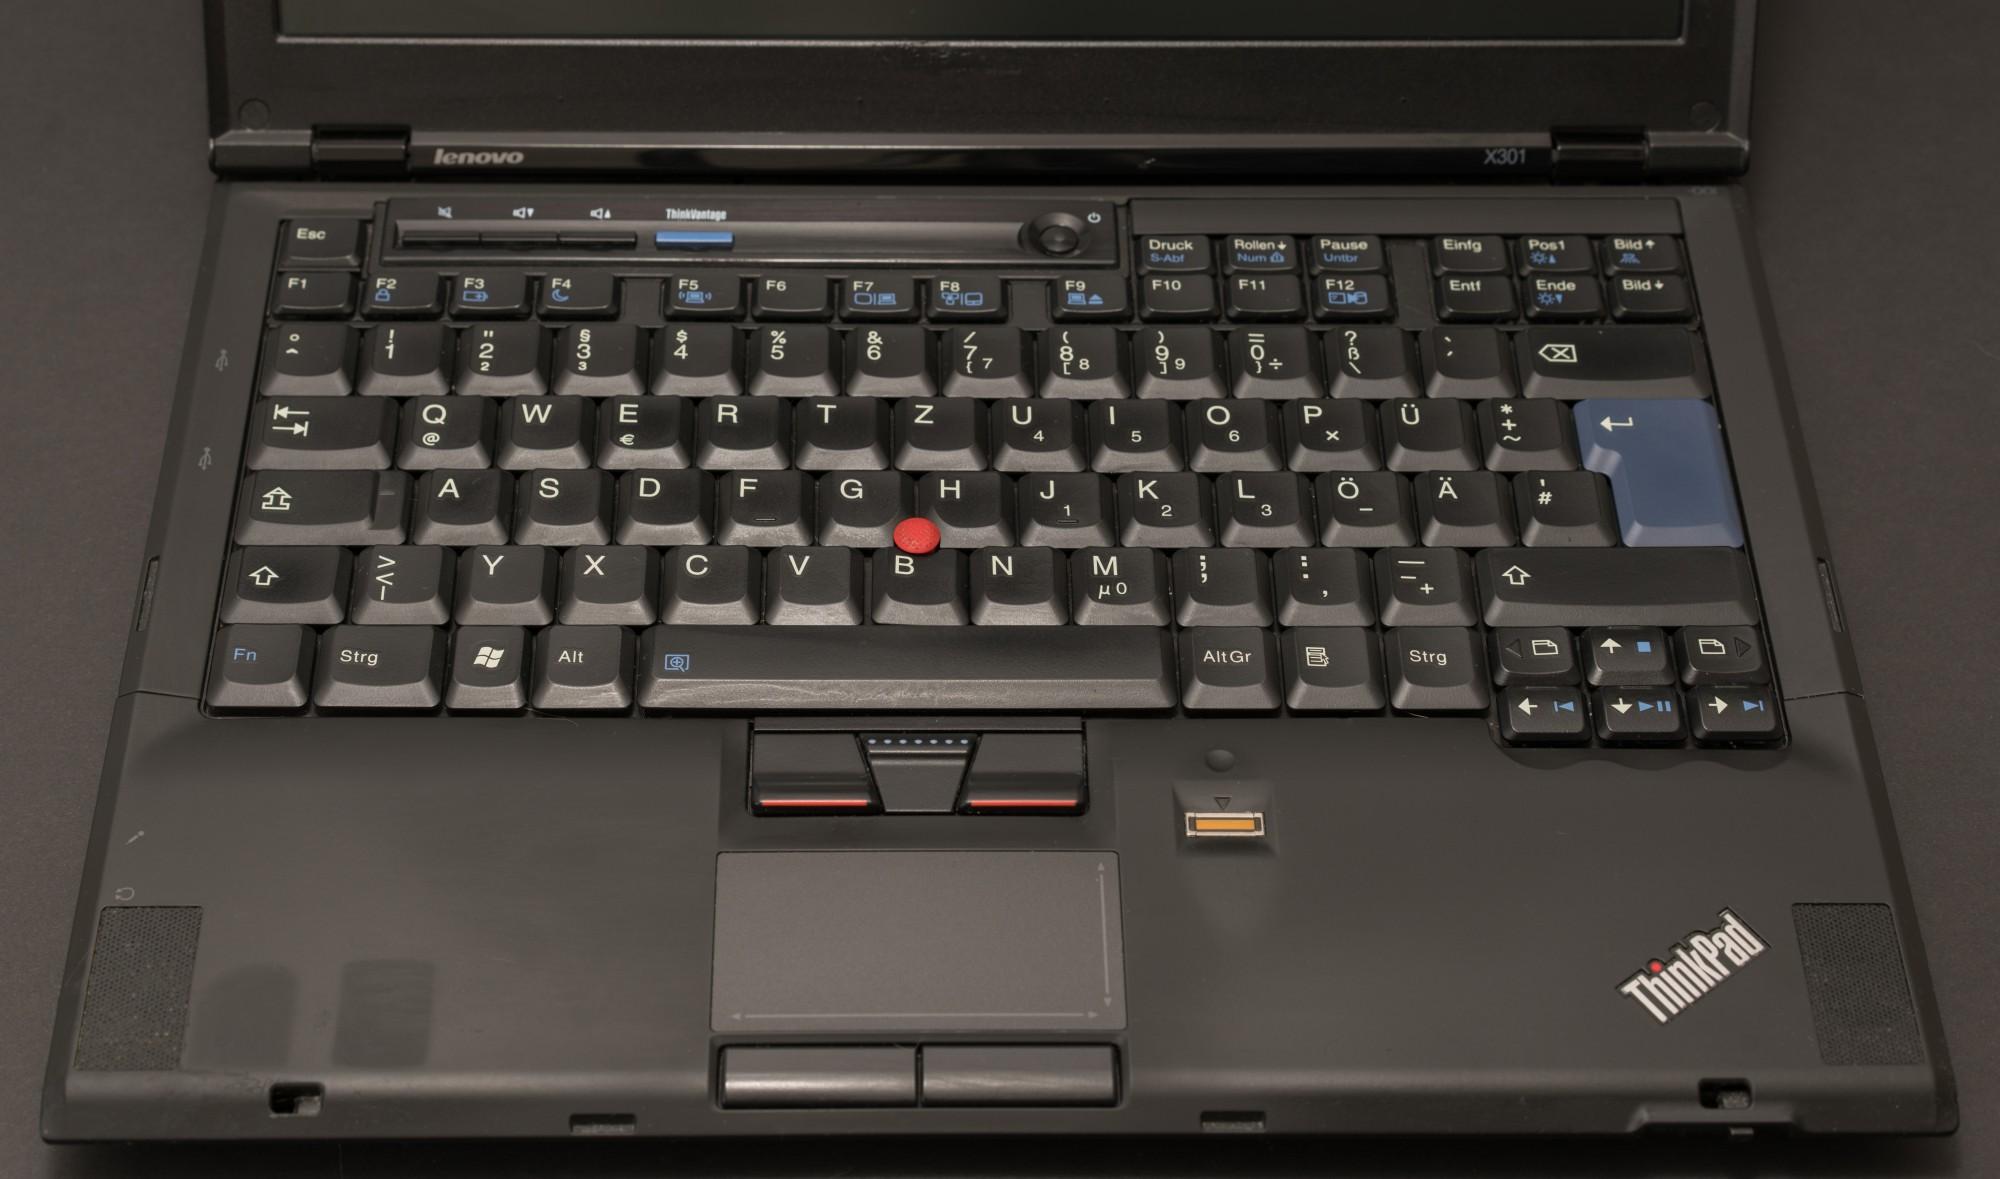 Древности: десять лет эволюции ноутбуков на примере ThinkPad X301 - 19